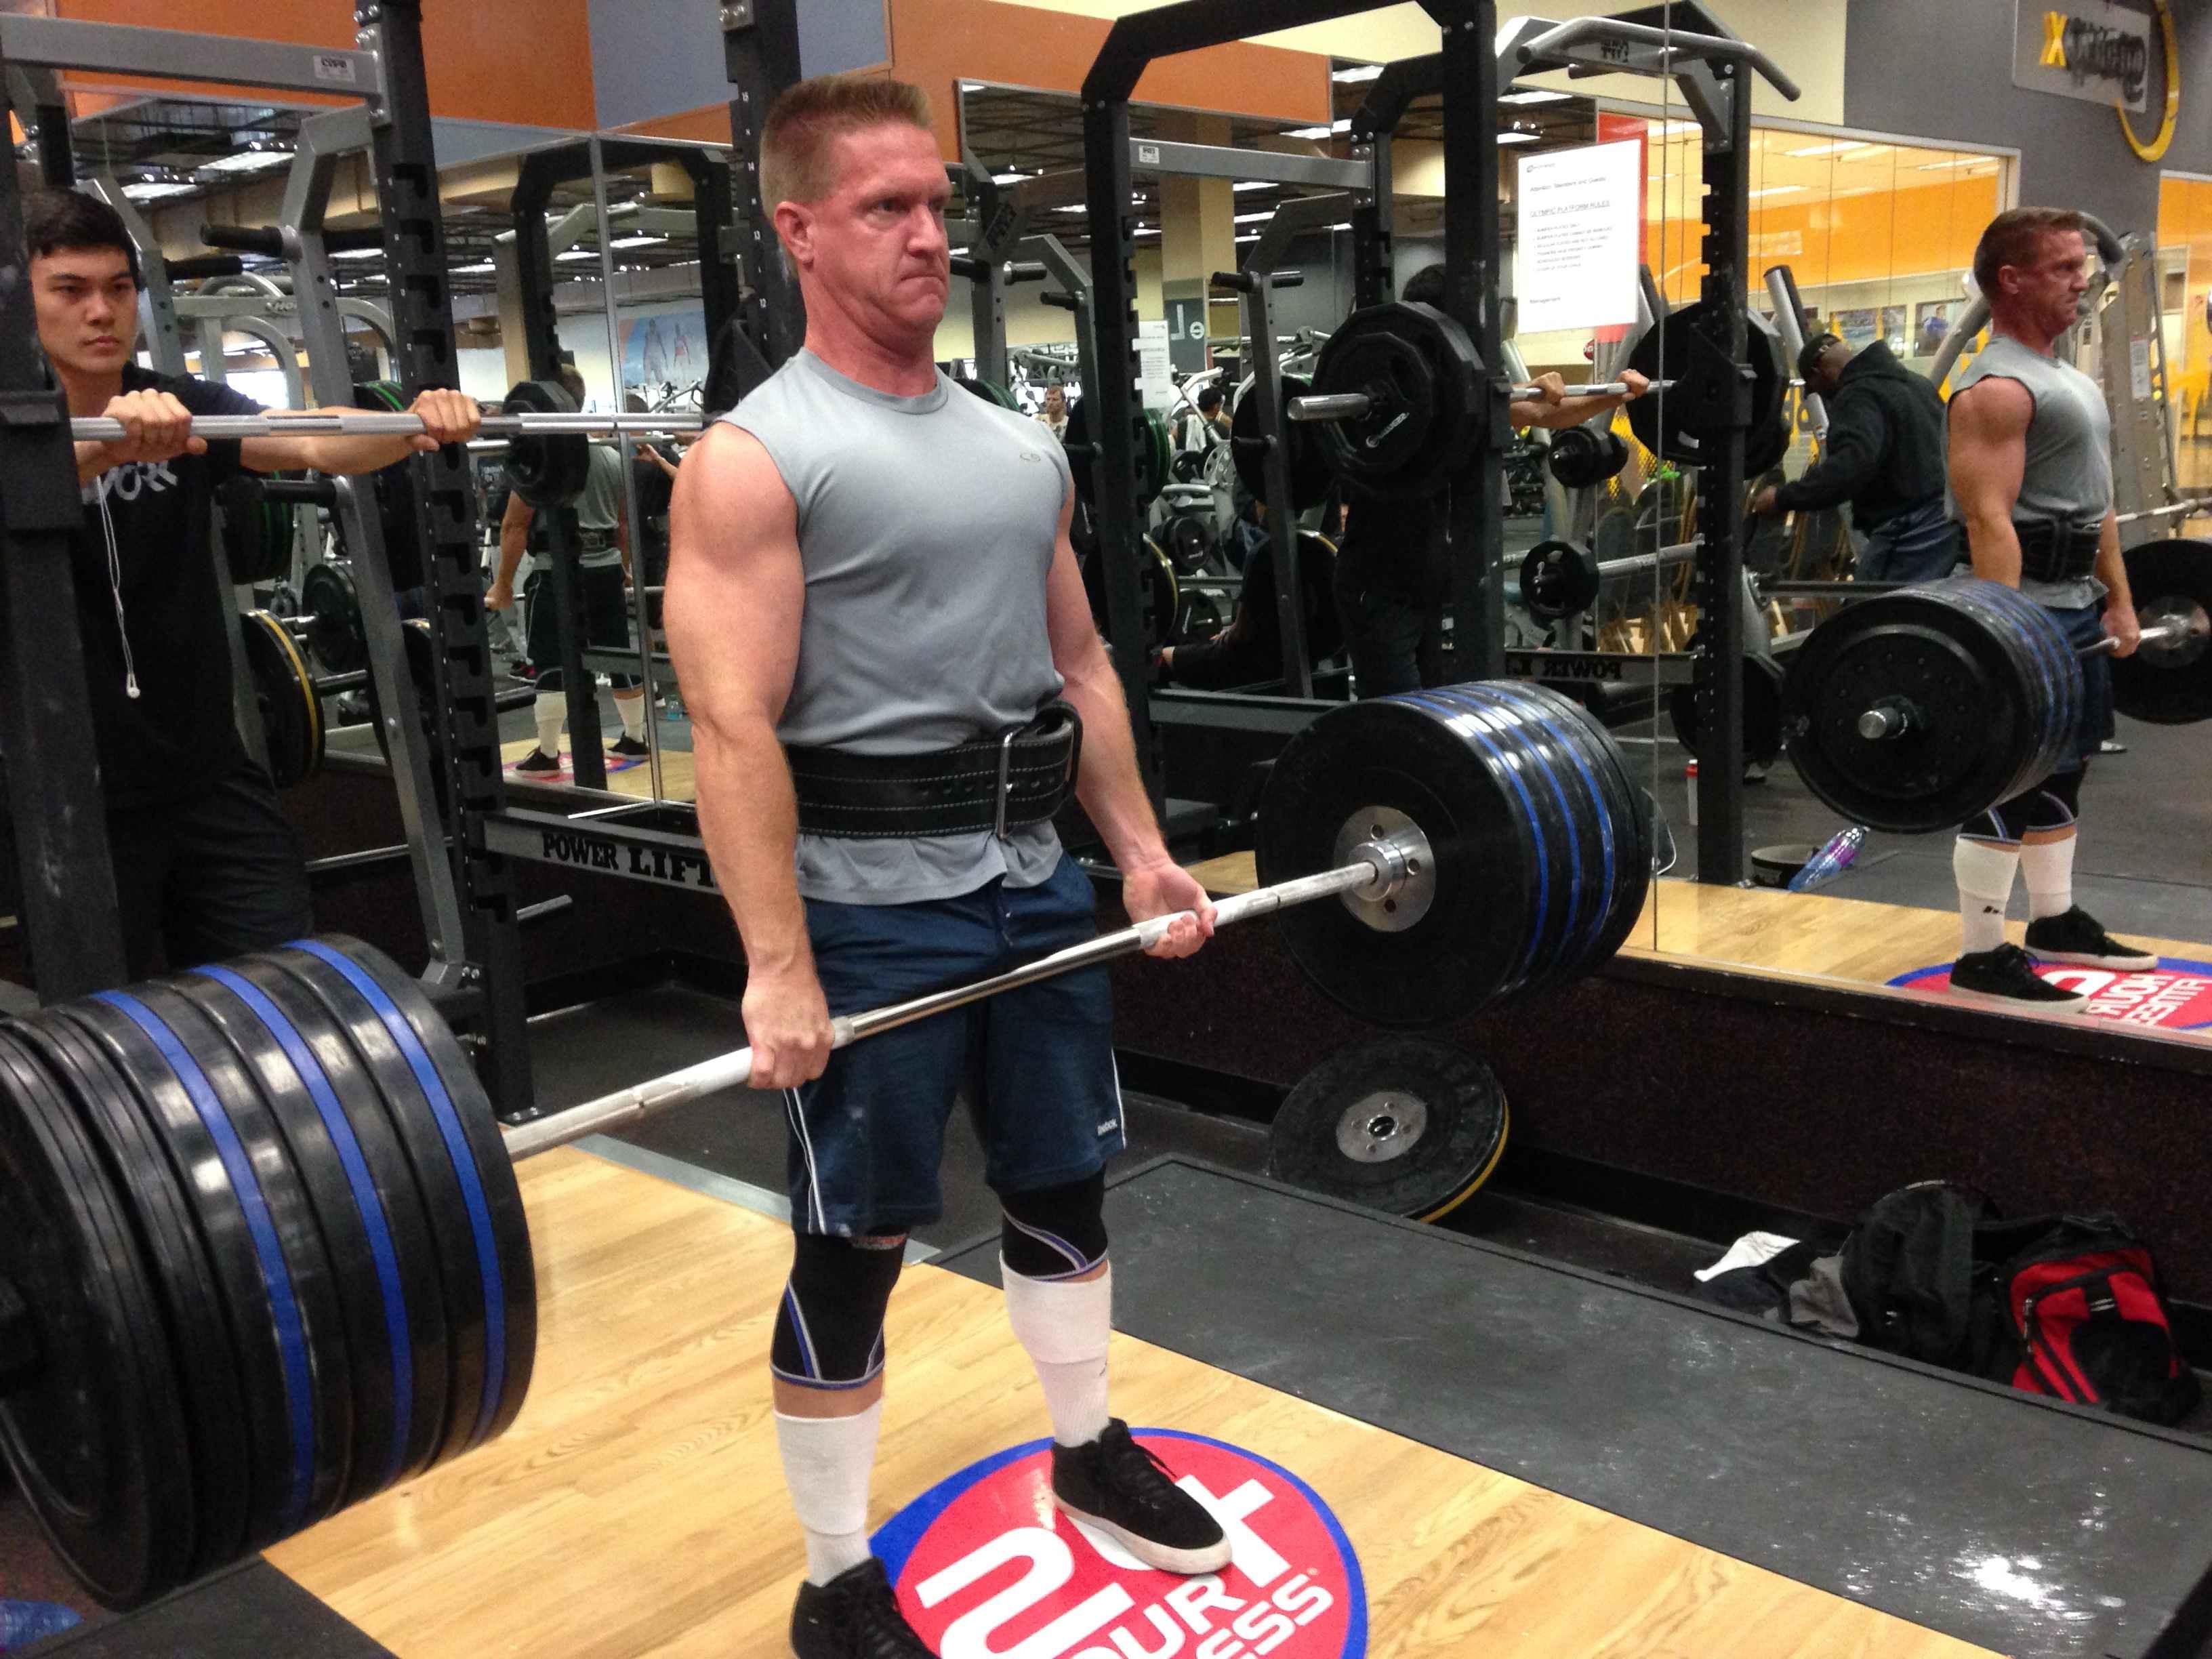 Matthew Chapman exercising in gym